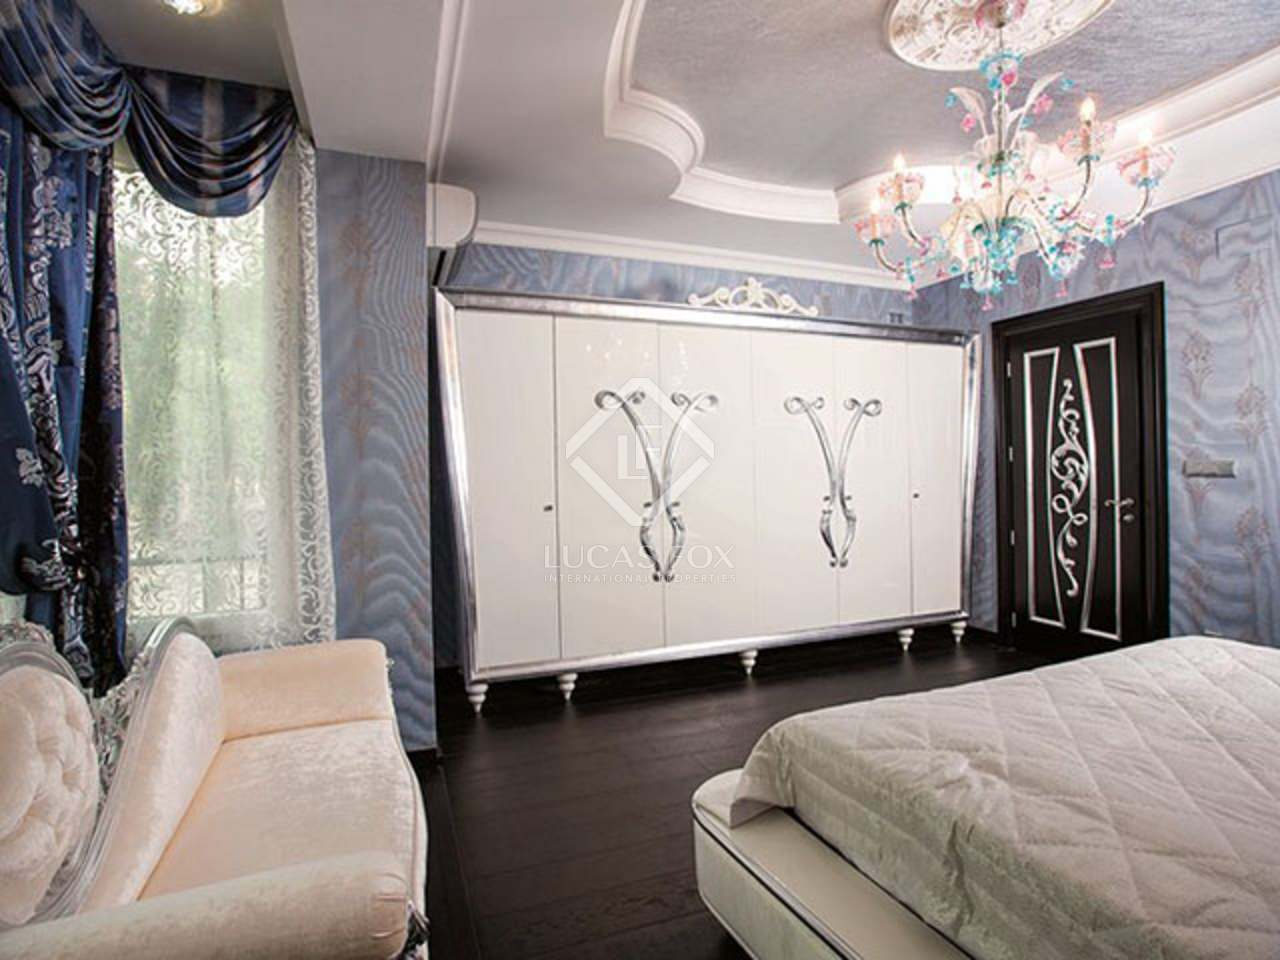 Appartement de luxe meubl louer madrid - Hm calle orense ...